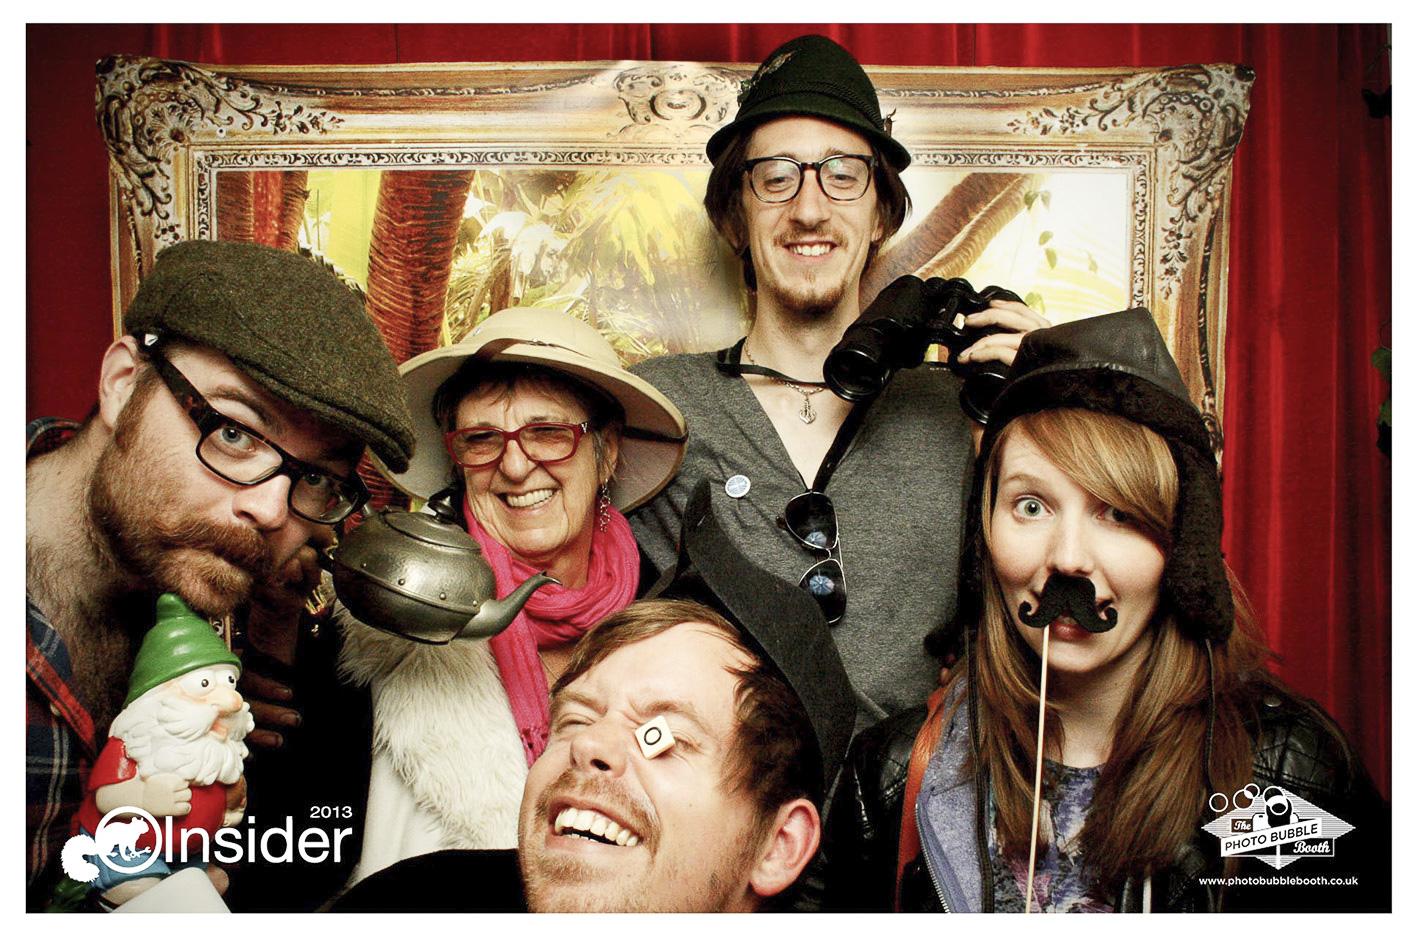 insider festival photo booth